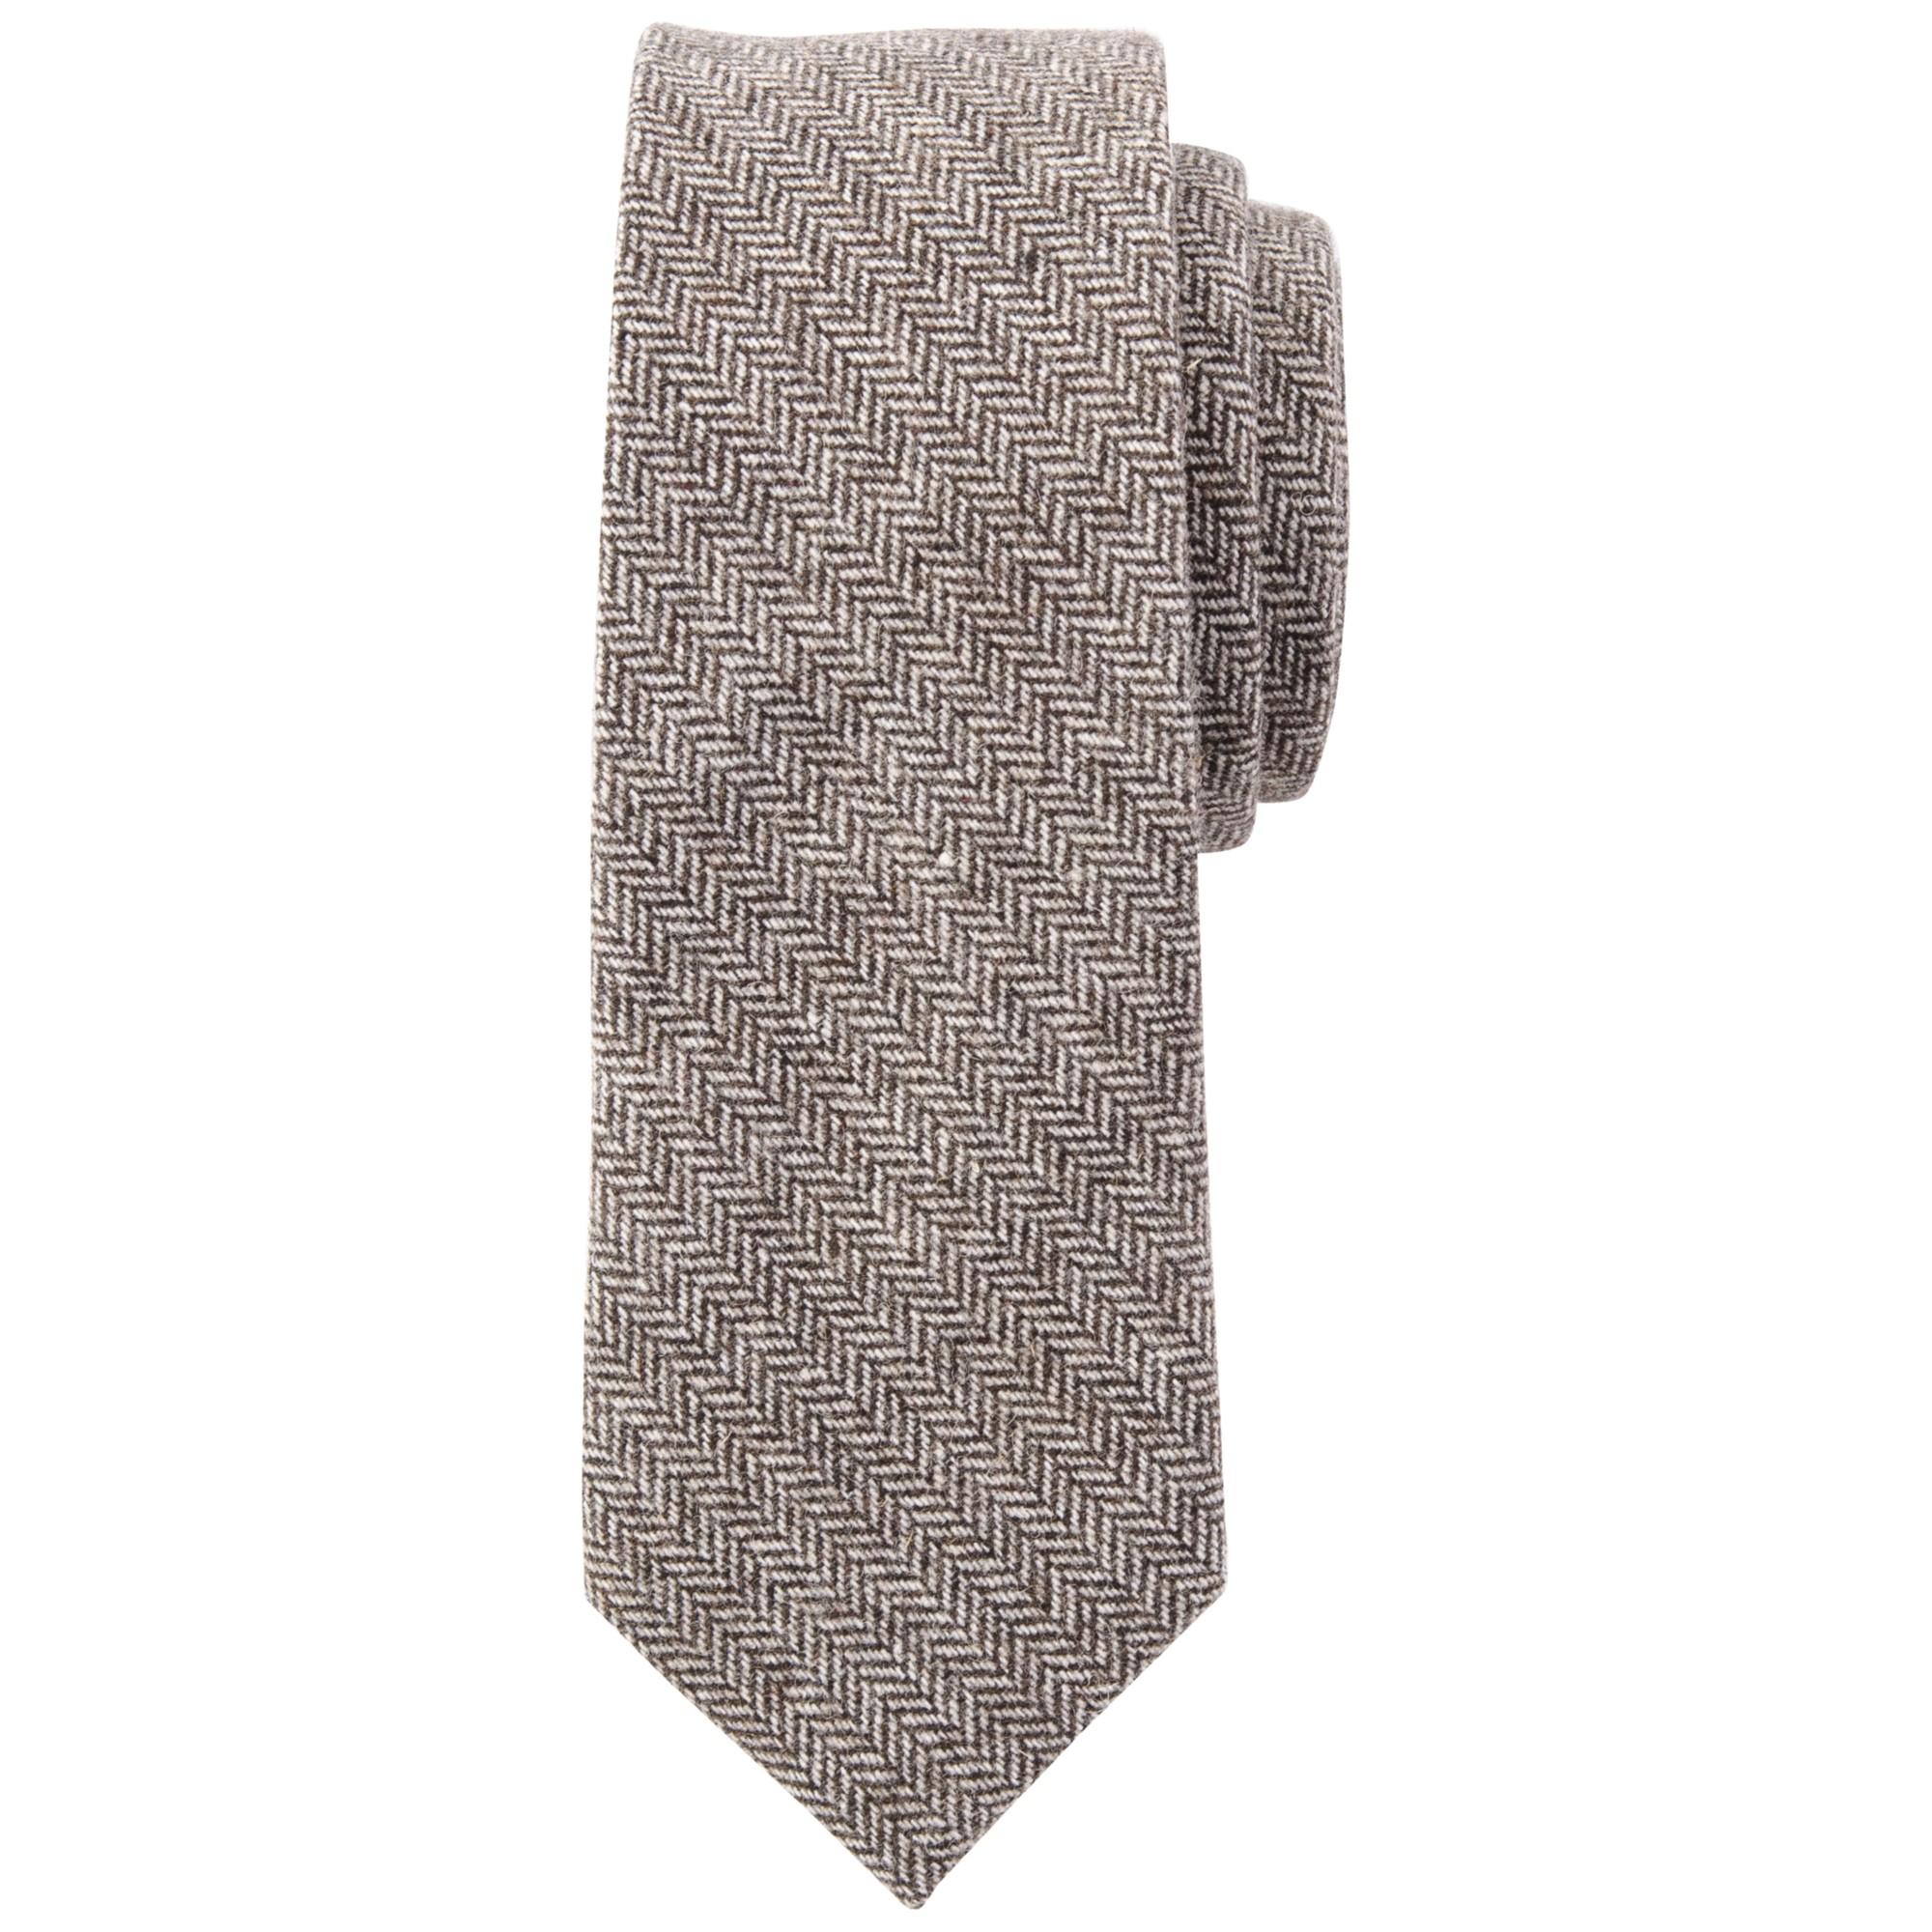 30178db58e0c John Lewis Herringbone Tie in Brown for Men - Lyst